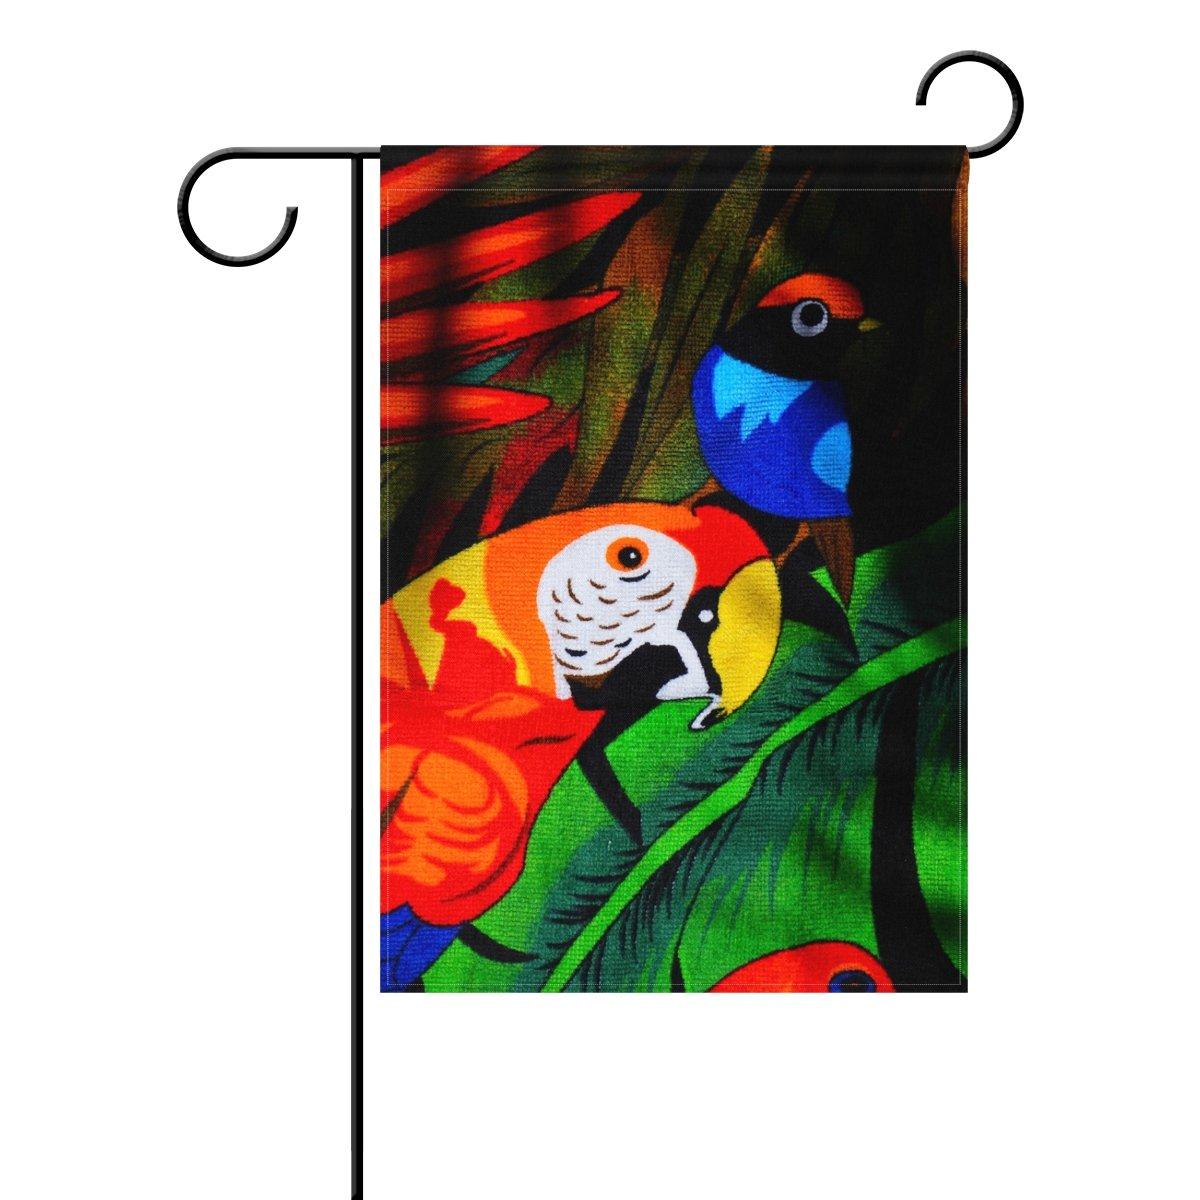 ALAZA Loro Doble decorativo Sided indicador jardín 12 x 18 18 18 pulgadas 208f7e